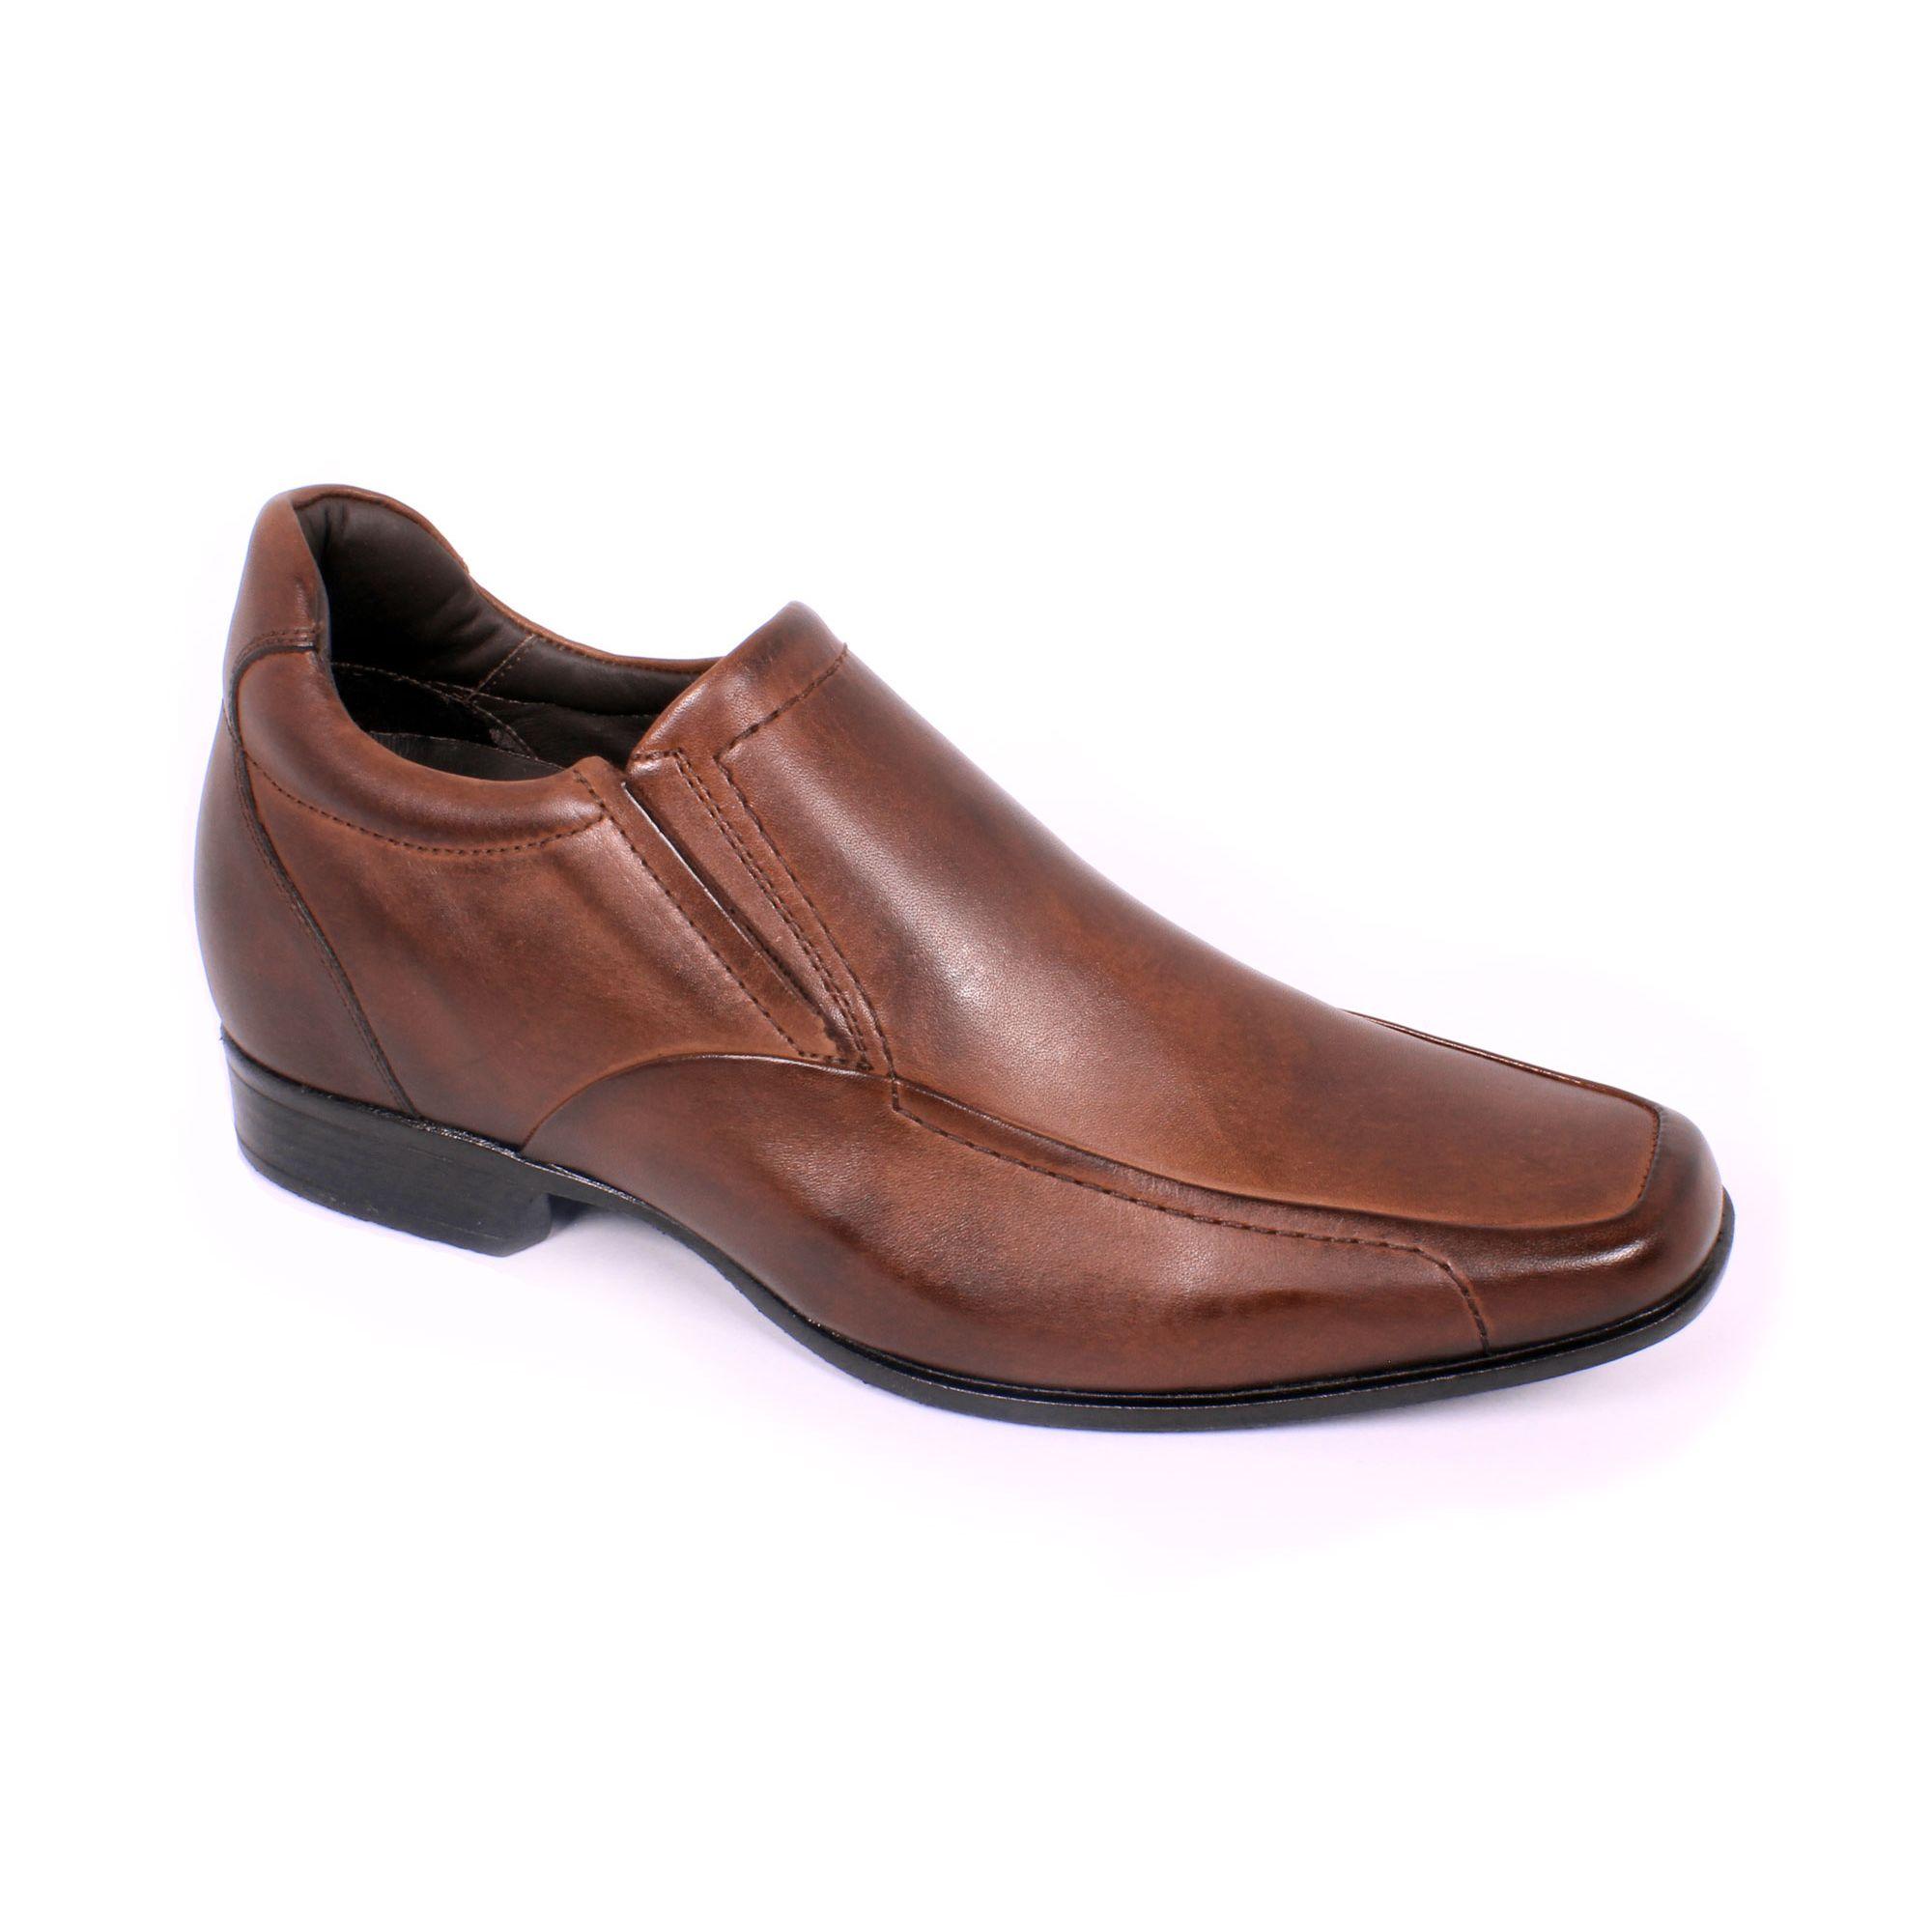 Zapato Formal Tabaco Café Max Denegri +7cm de Altura_70845